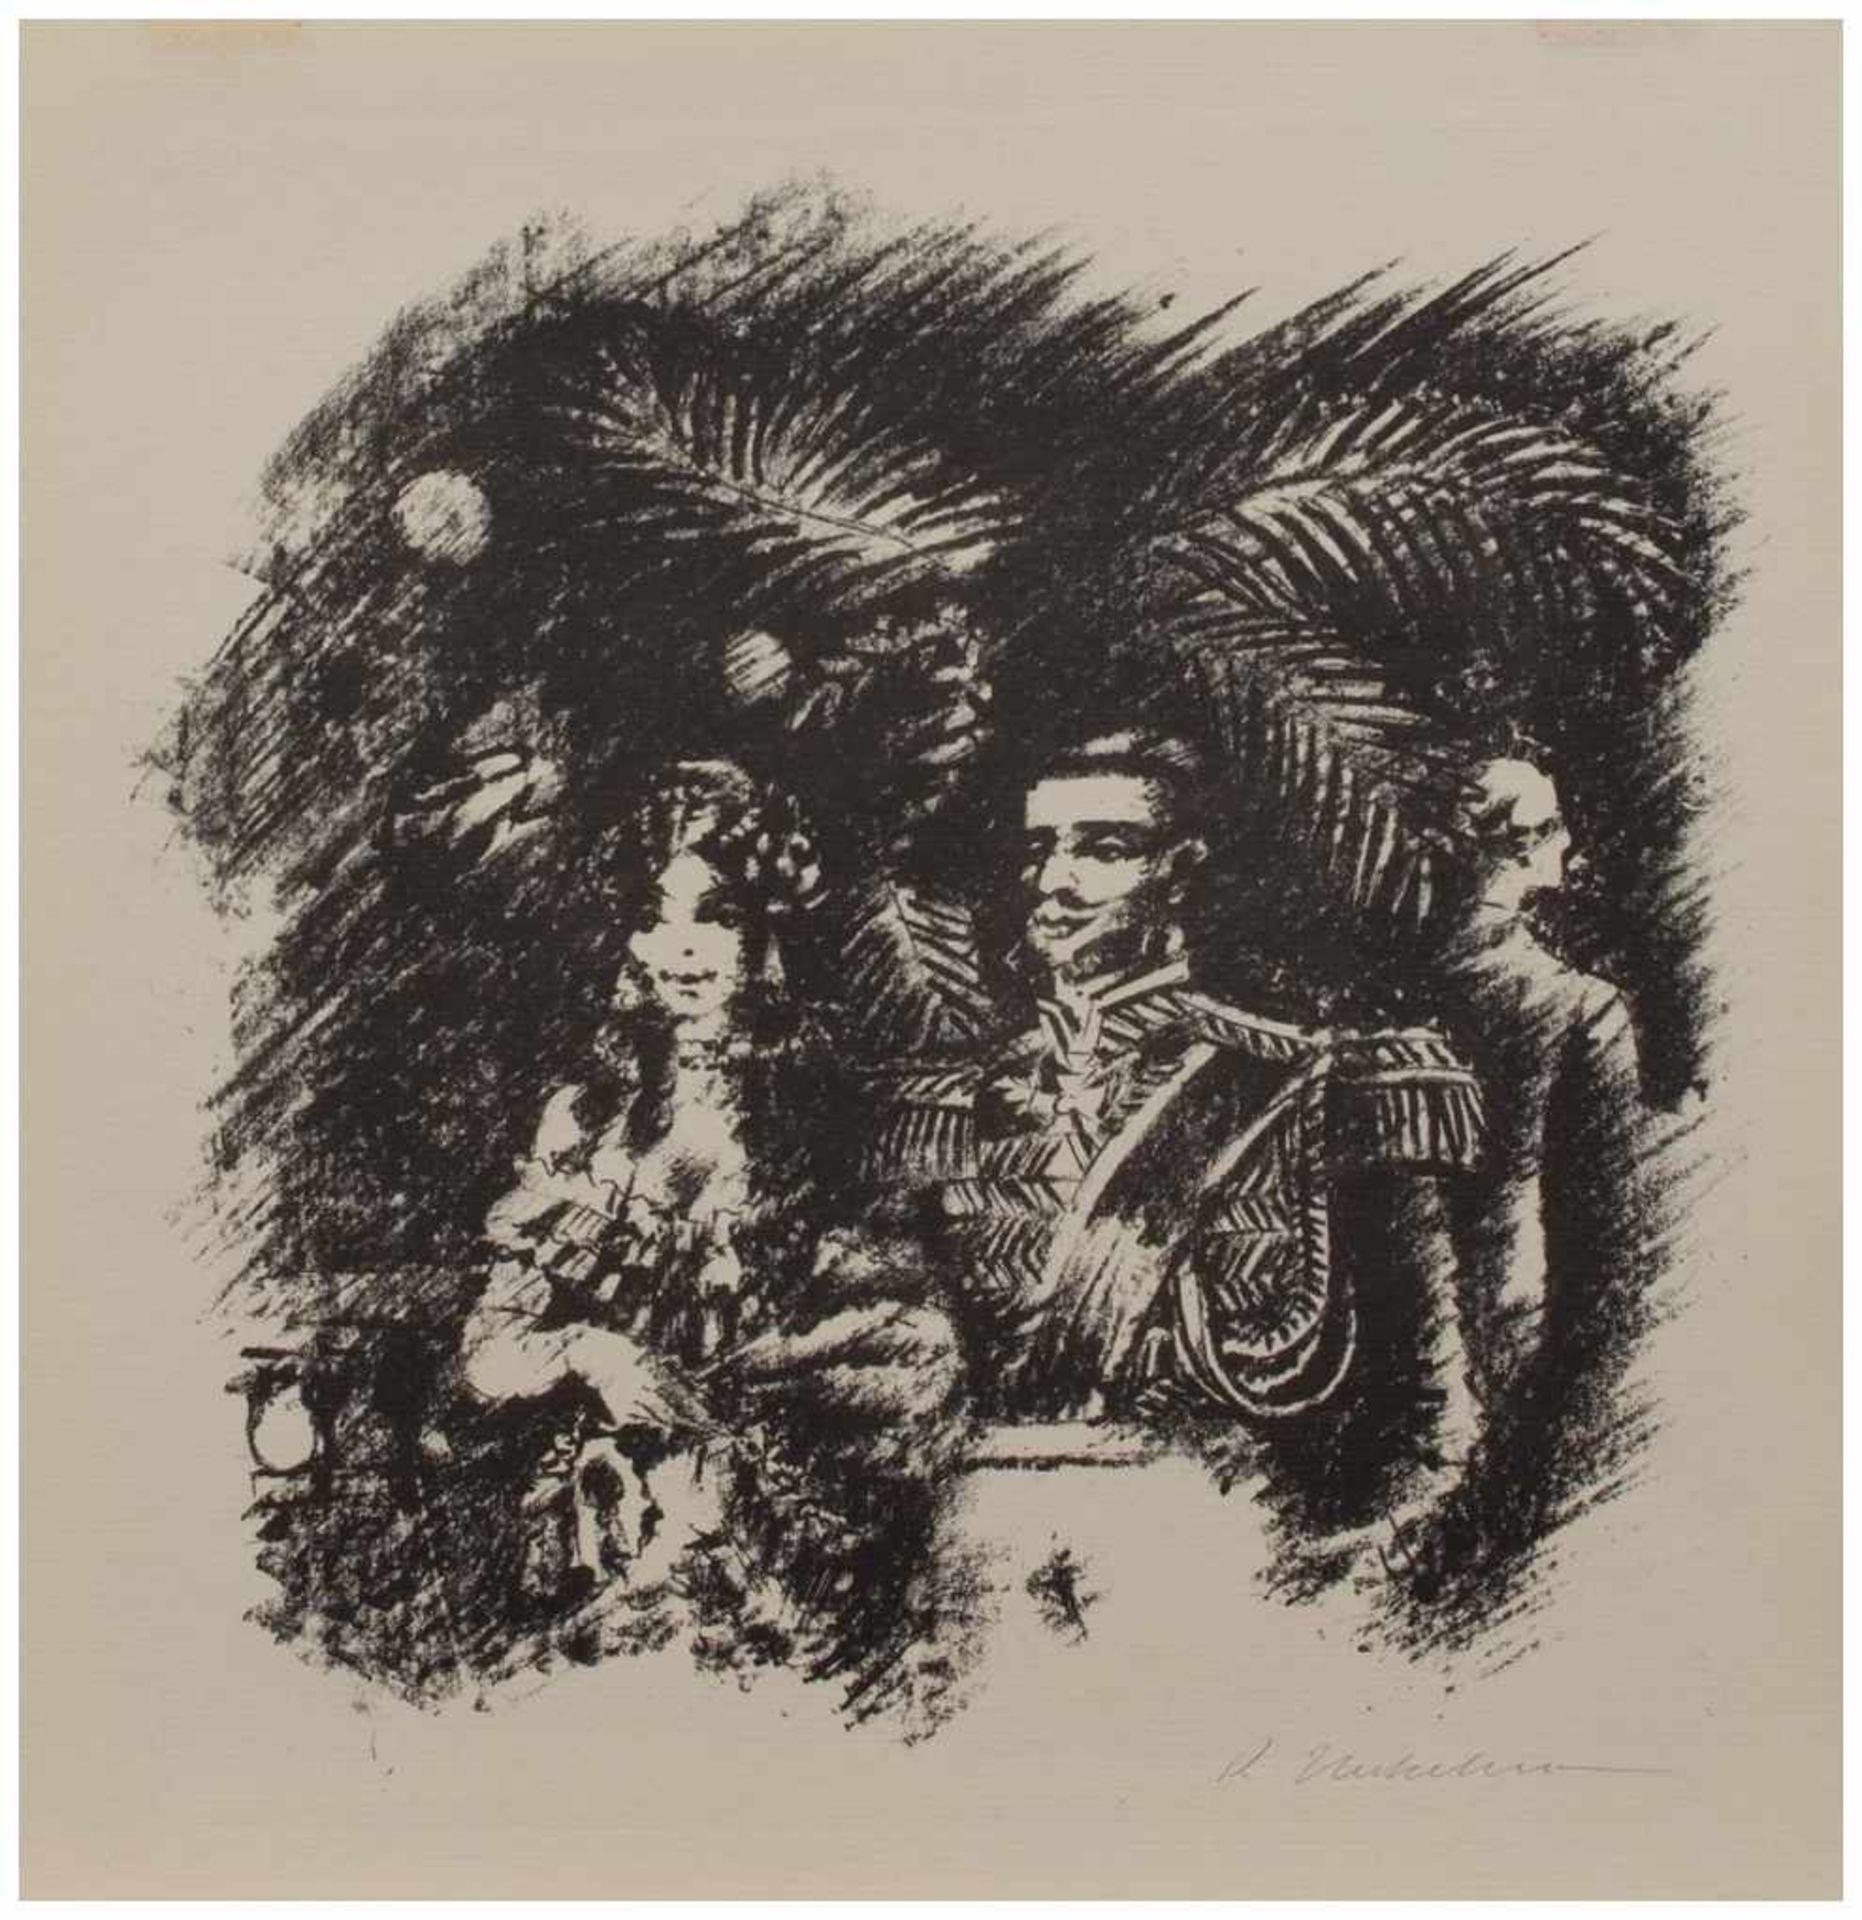 Los 31 - Ramòn Neckelmann (Hamburg 1907 - 2000 ebenda, deutscher Maler u. Grafiker, Std. i. Paris u.